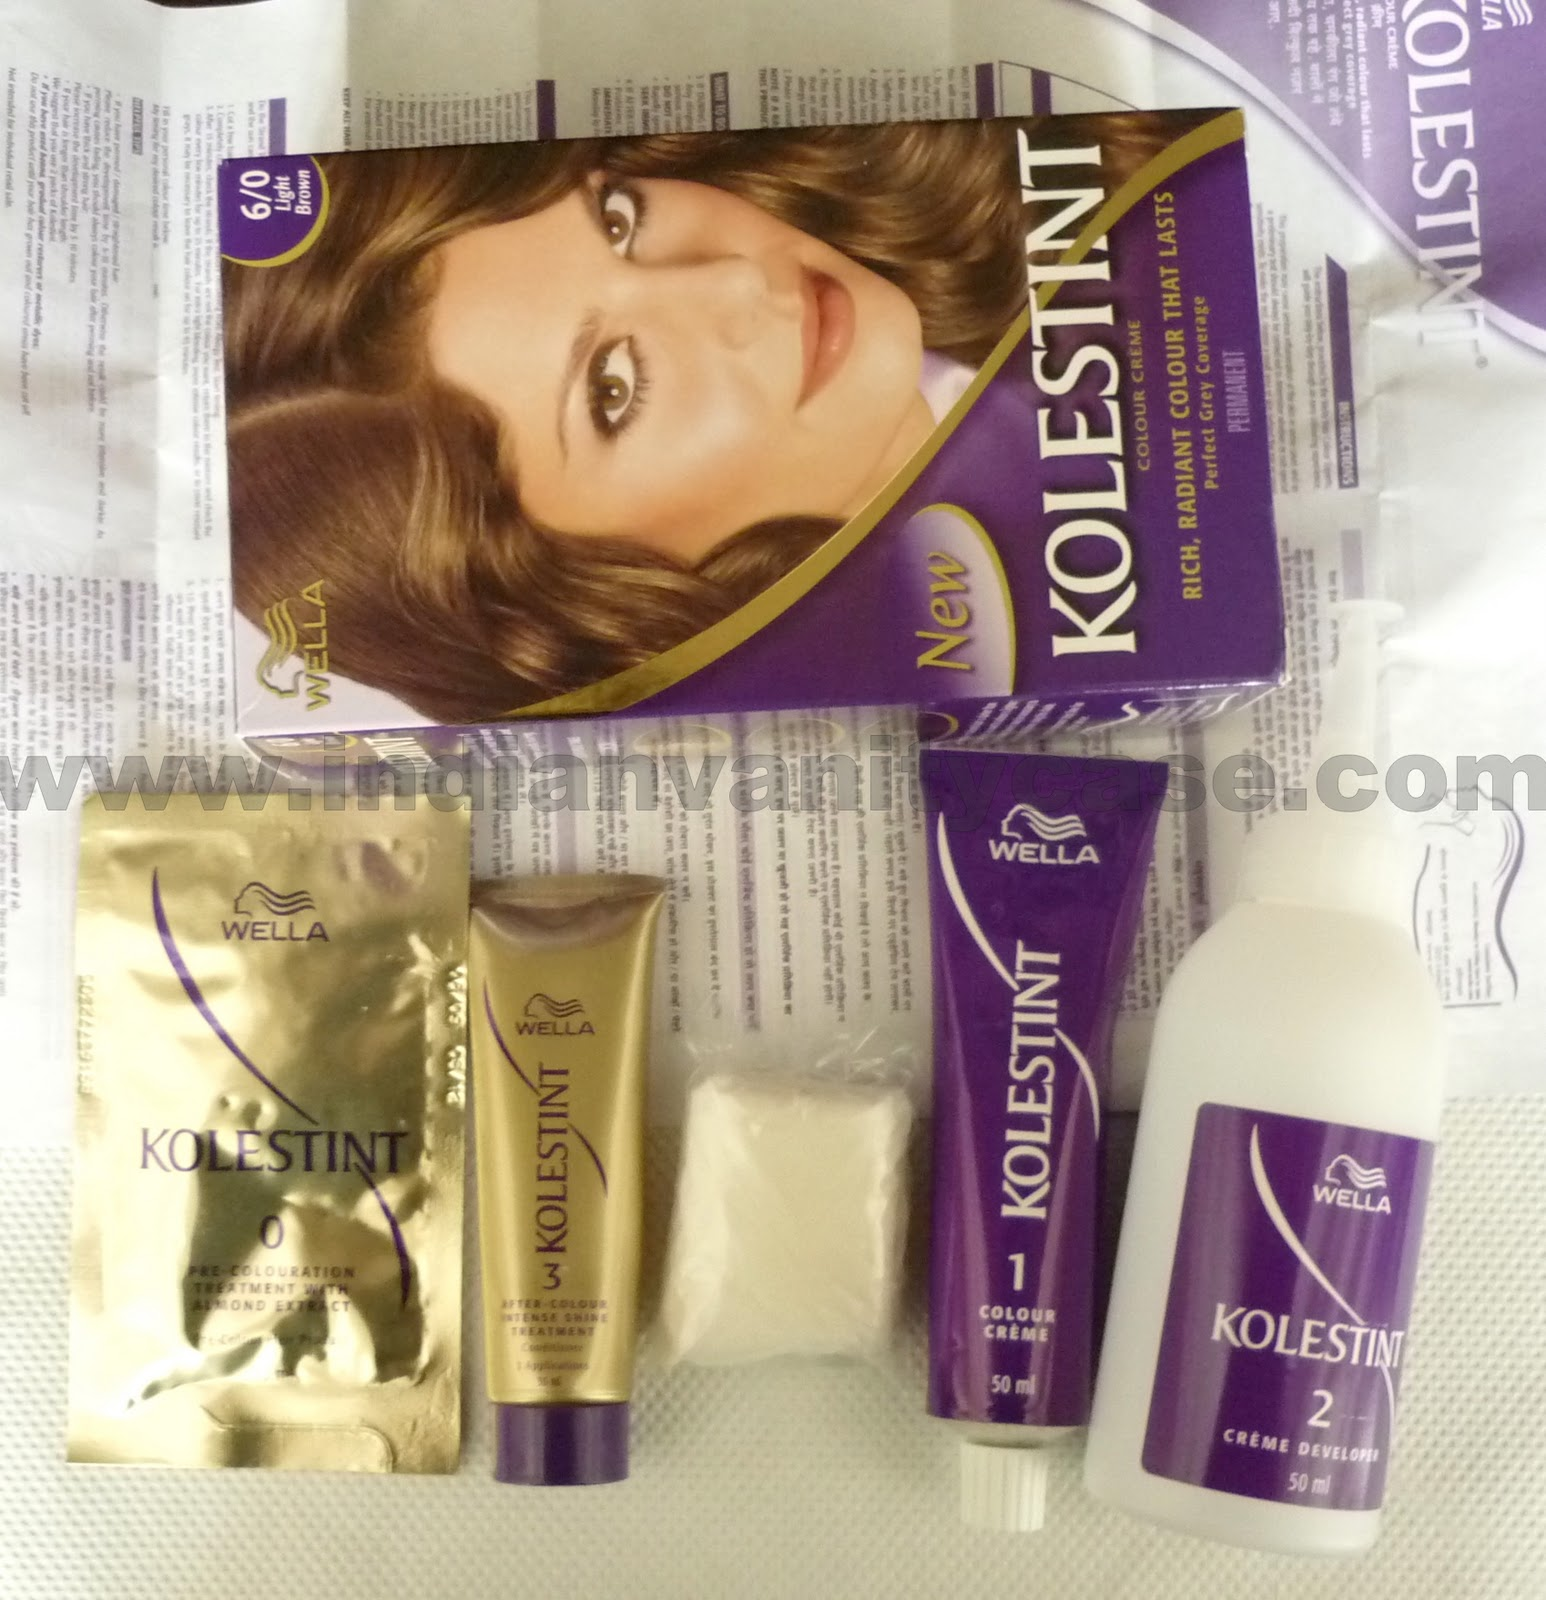 Indian Vanity Case Wella Kolestint Hair Color Review Swatch